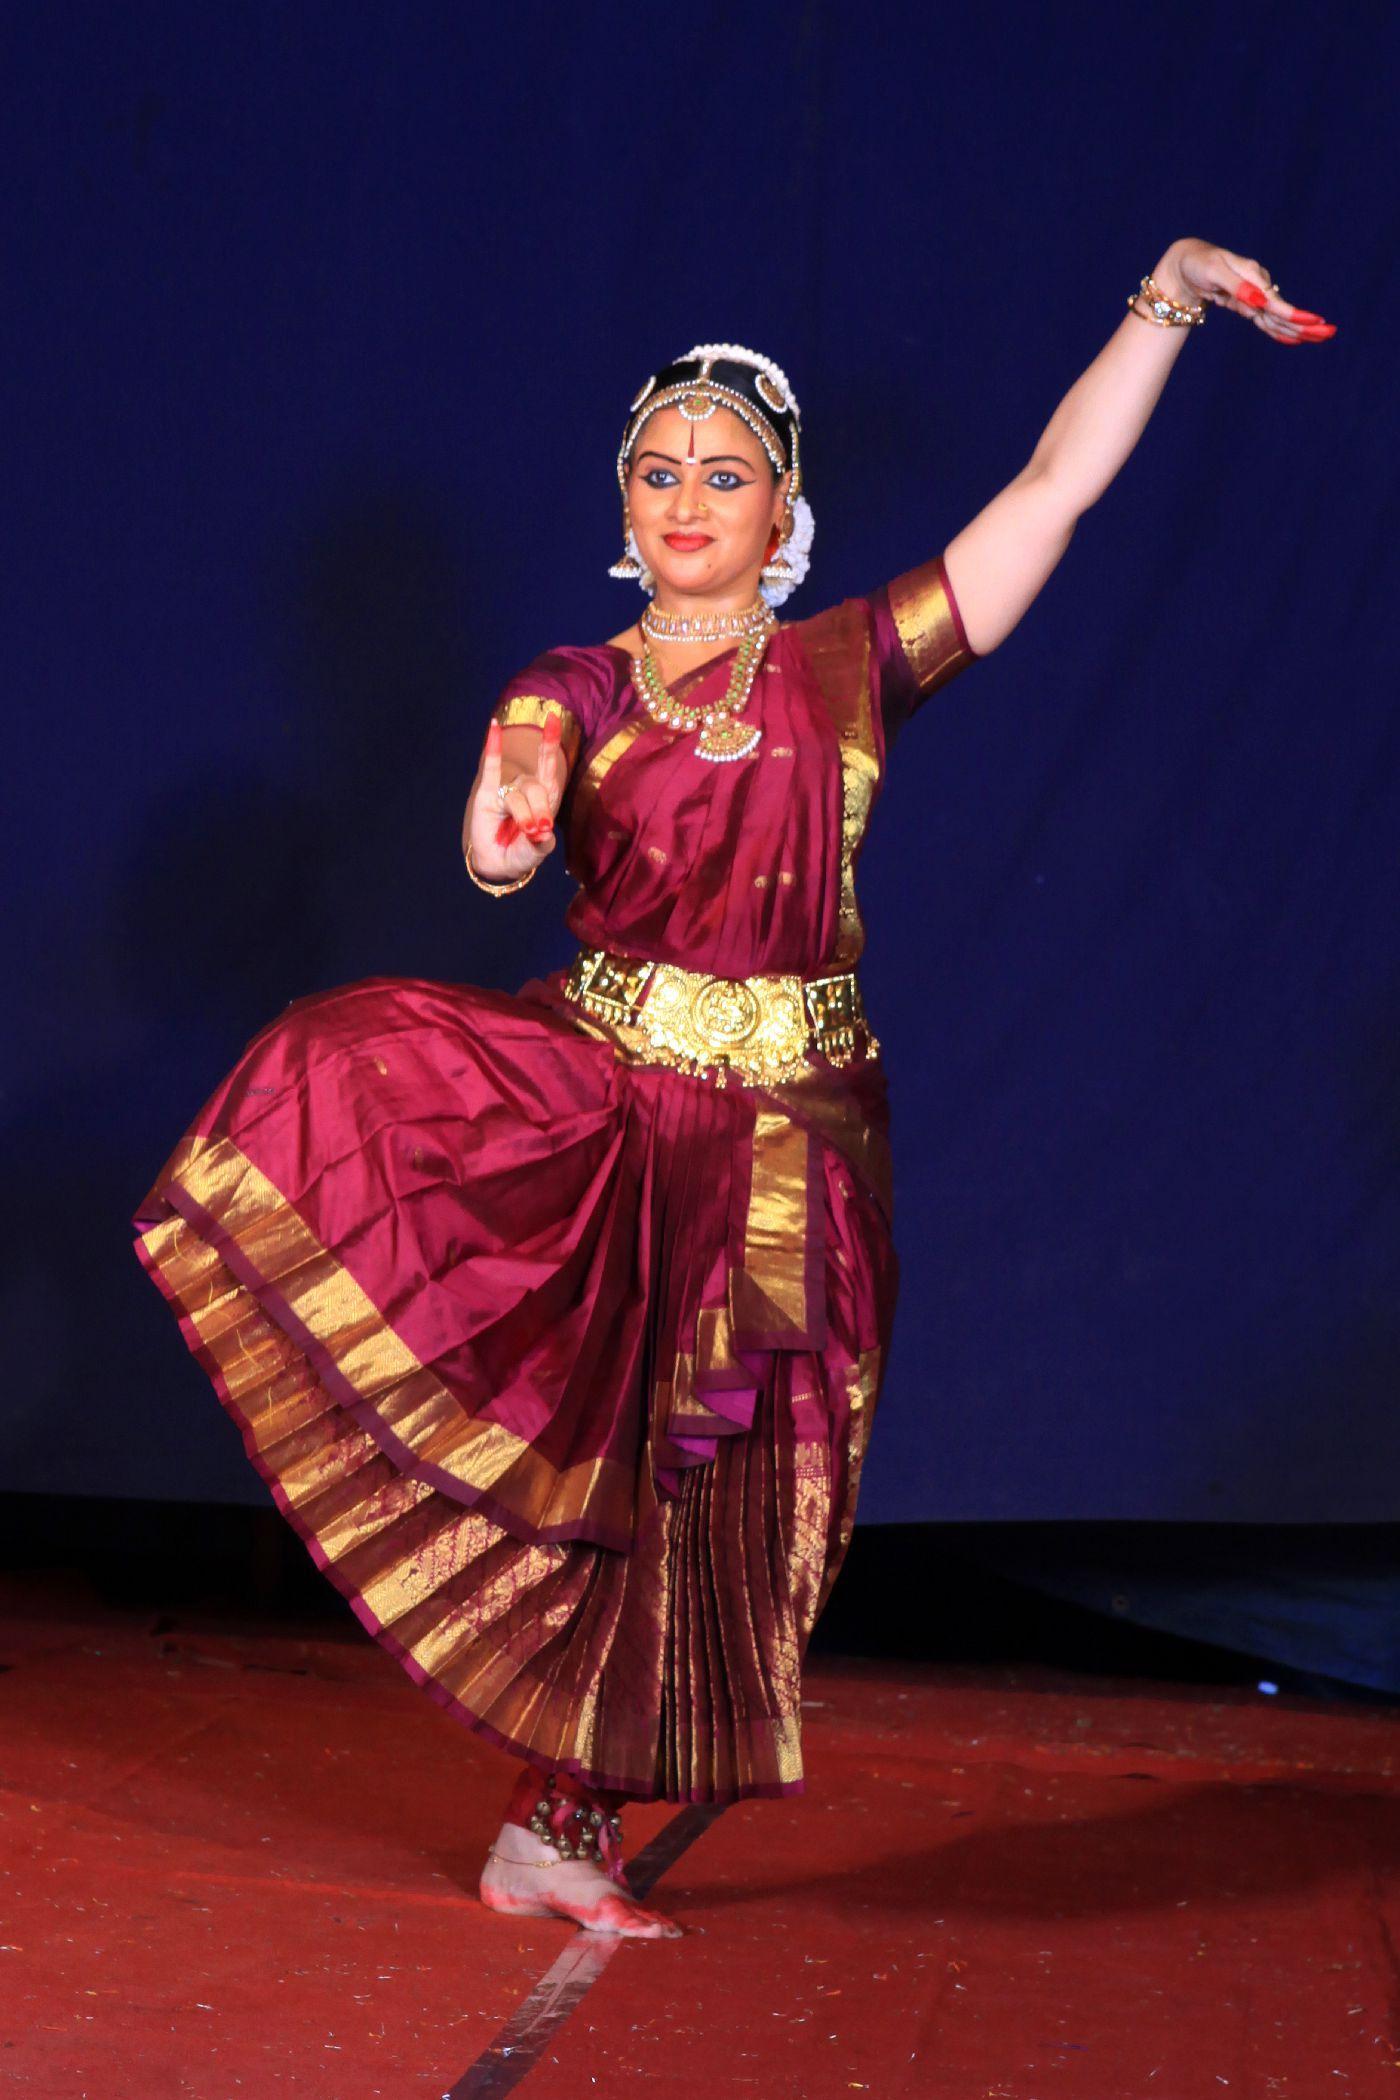 Classical dance classes in bangalorebharatnatyam classes